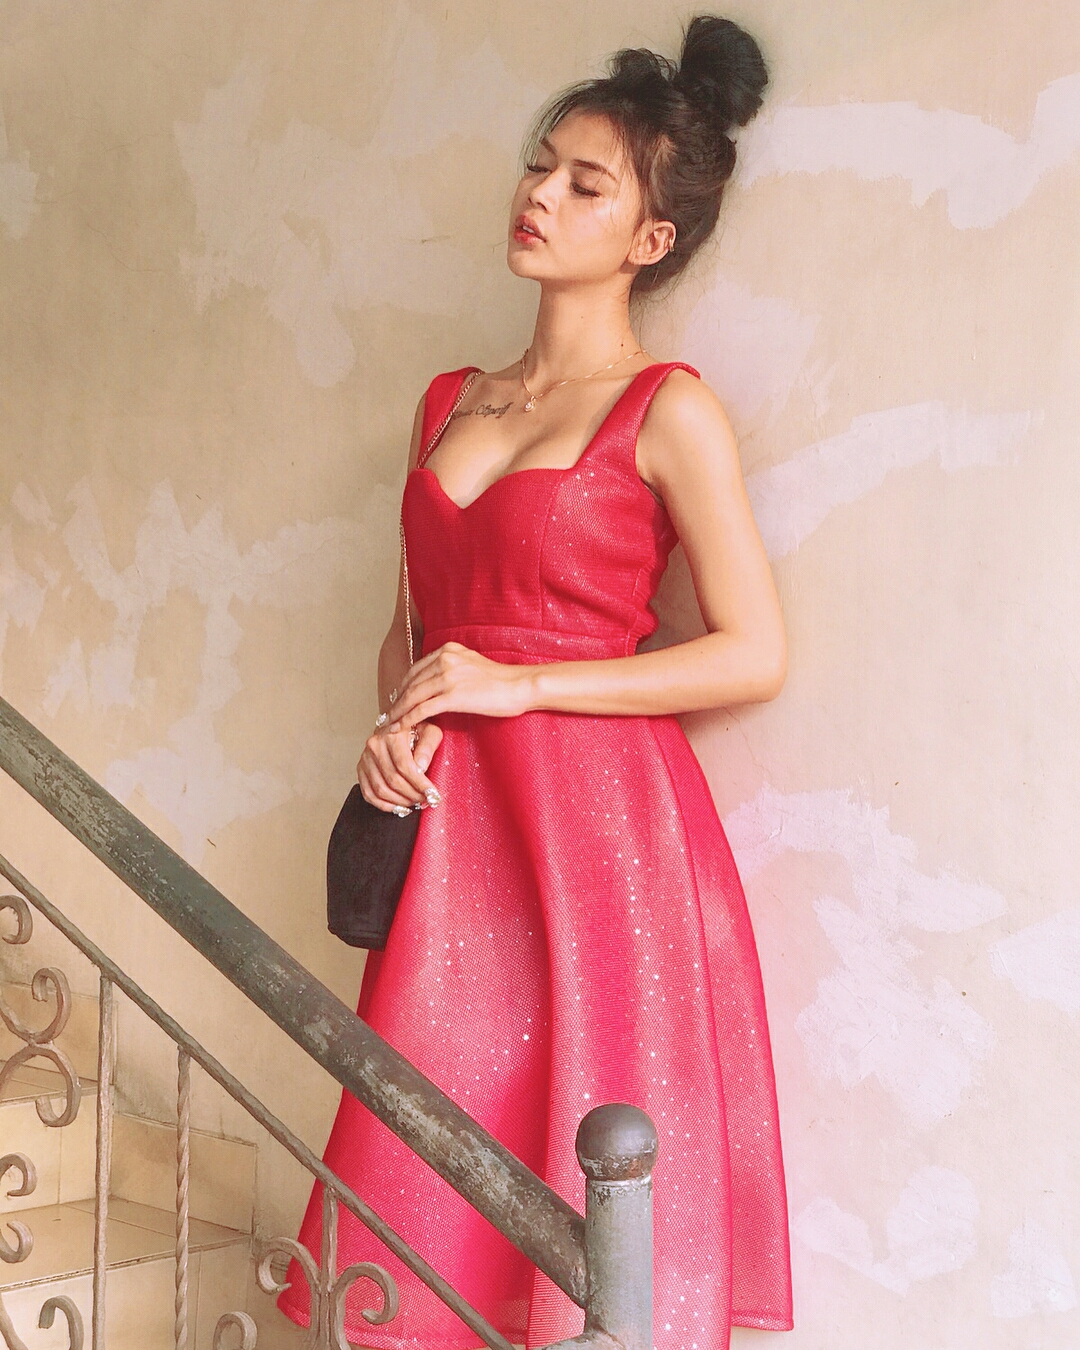 Dinda Syarif  Most Beautiful Transgender Models From -8854